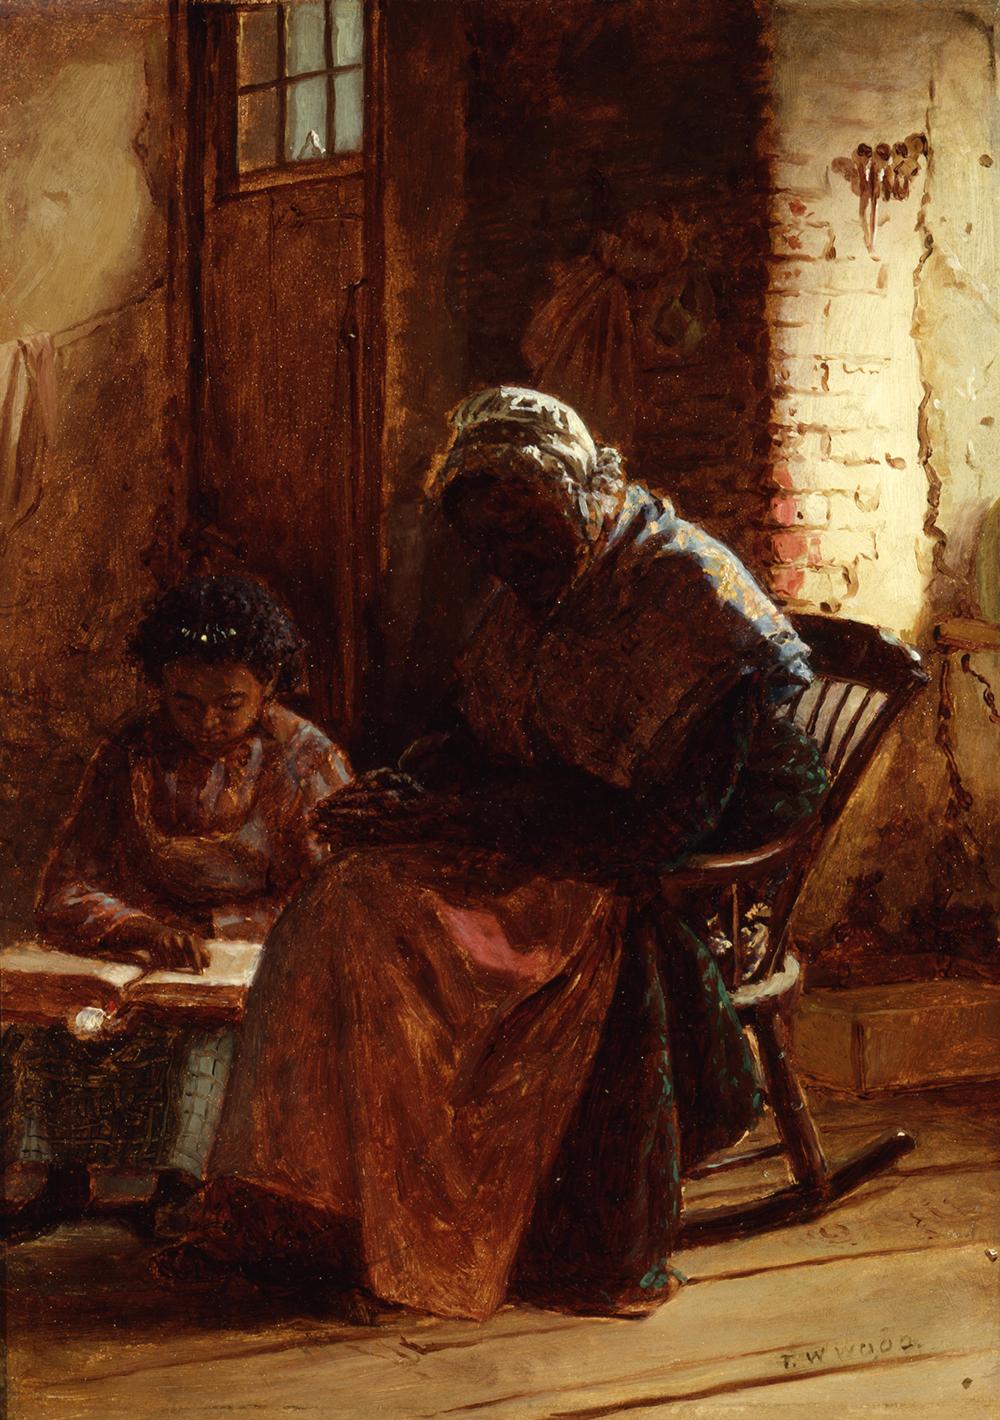 Sunday Morning, by Thomas Waterman Wood, c. 1877.